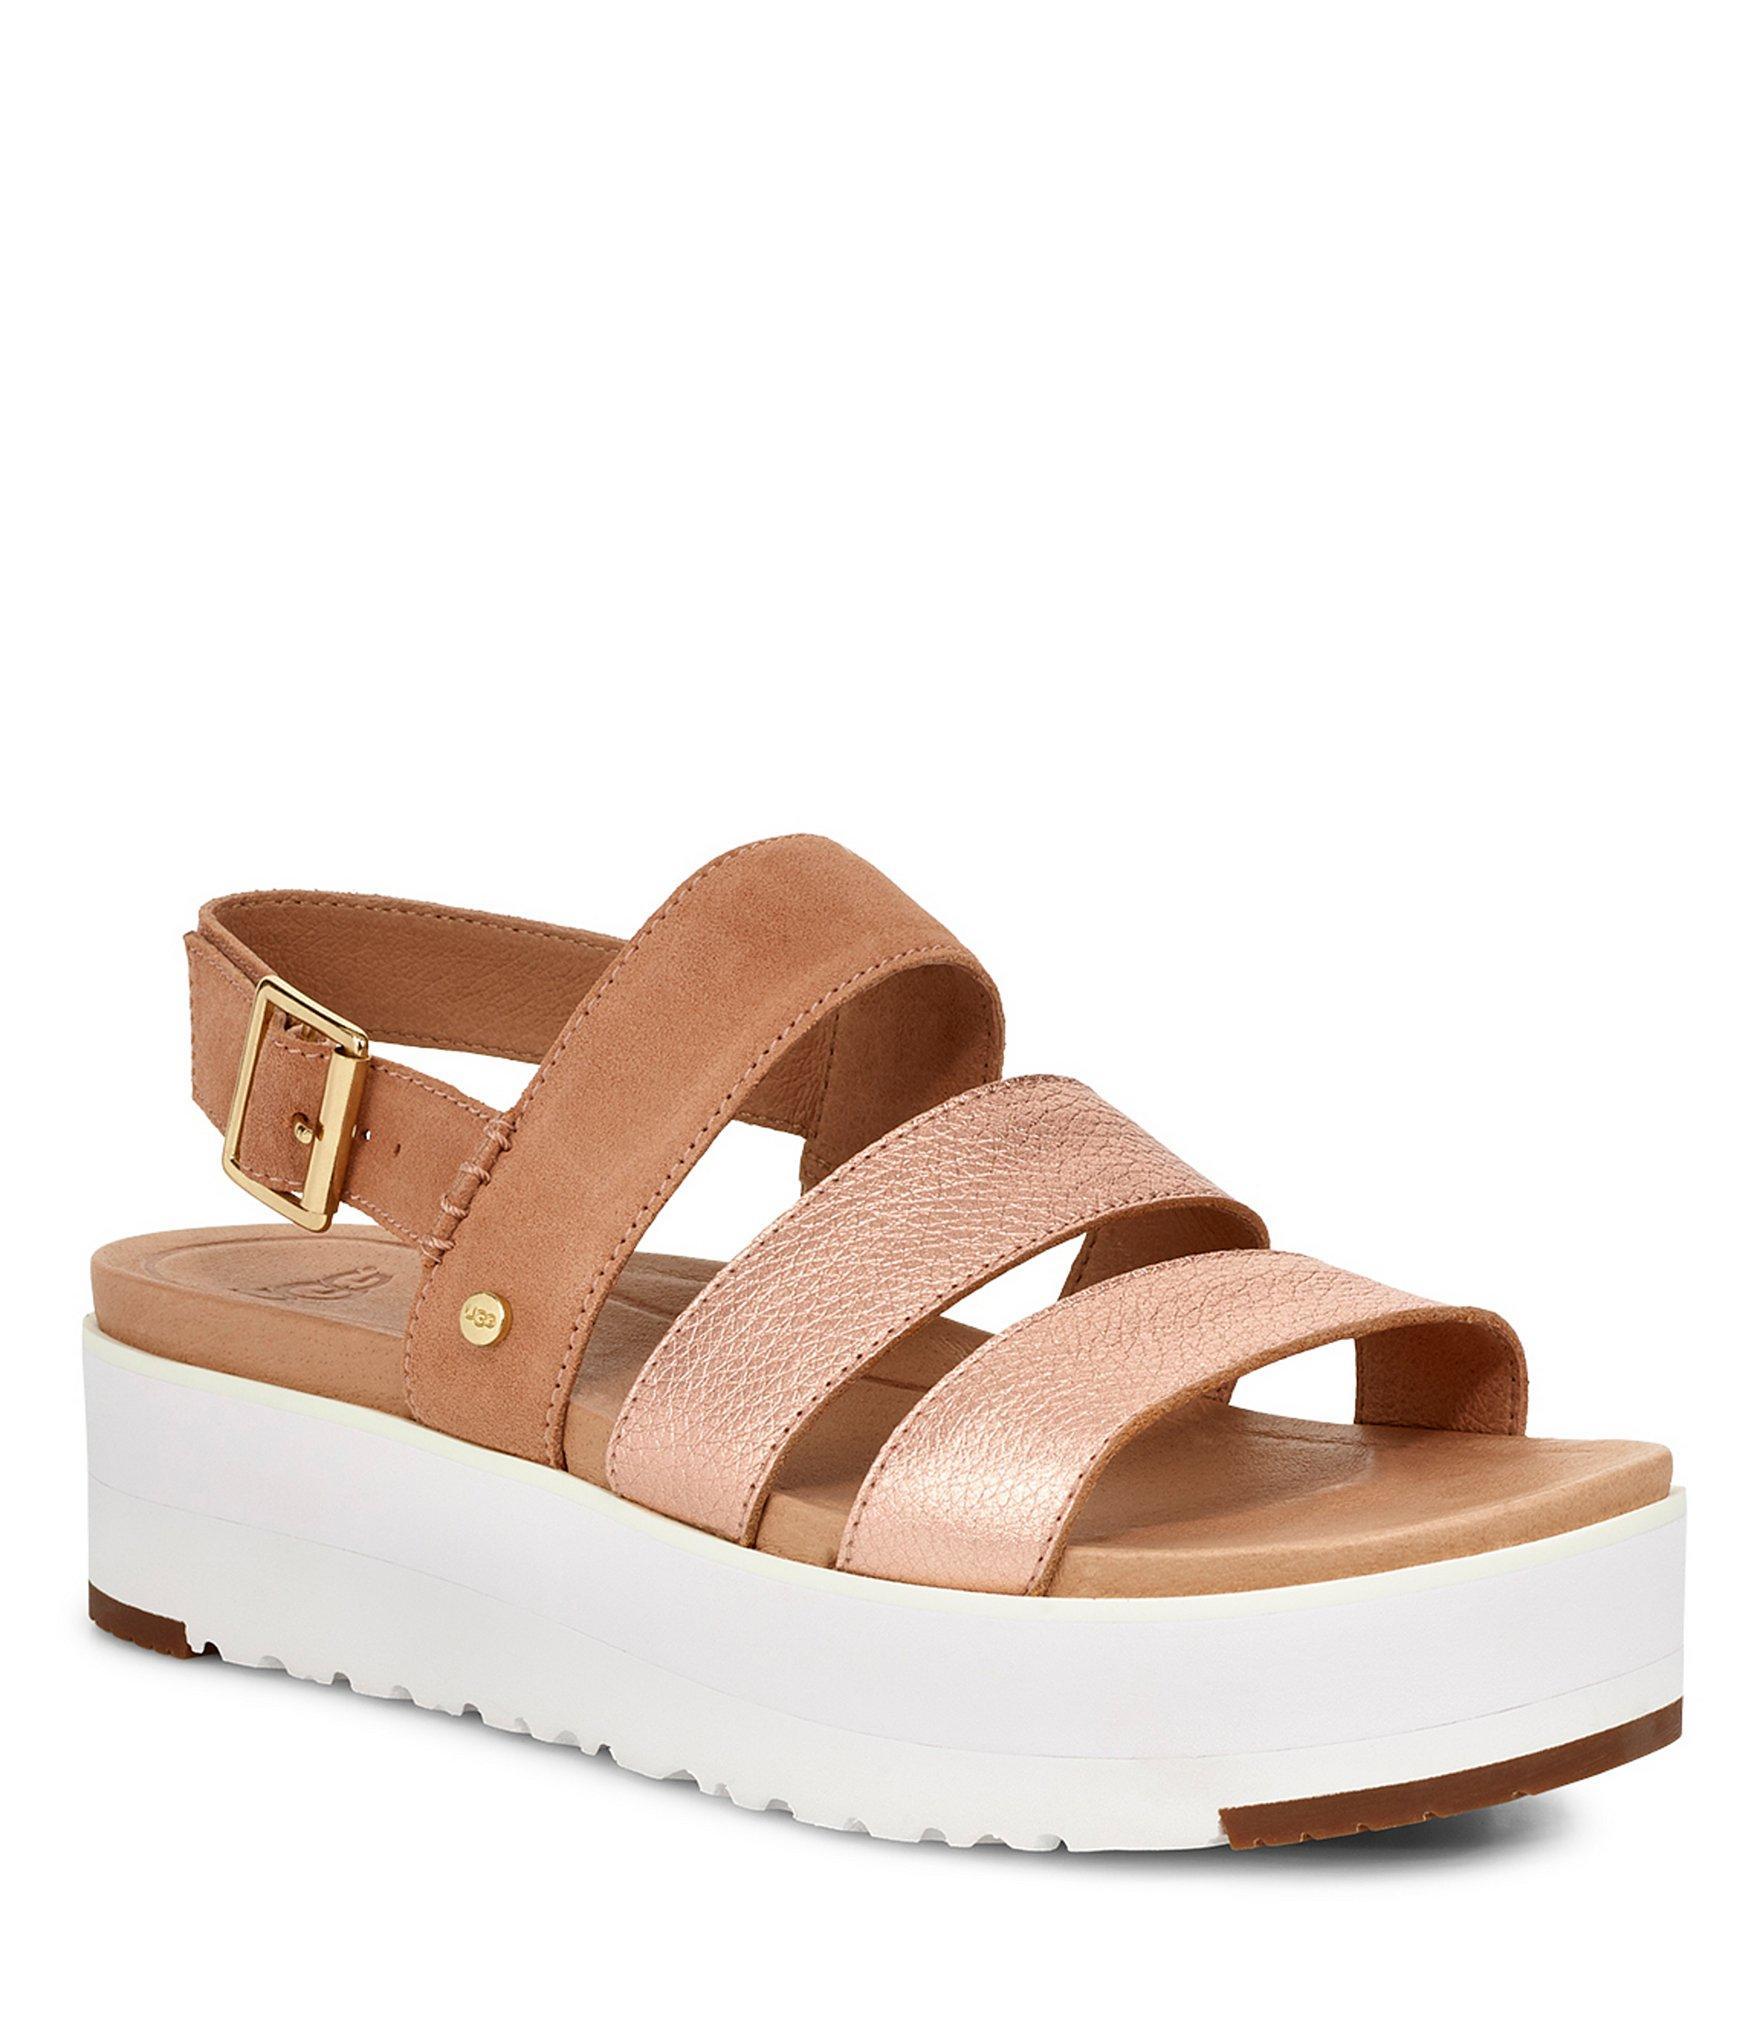 379ecc9ba773 UGG. Women s Braelynn Metallic Sandals